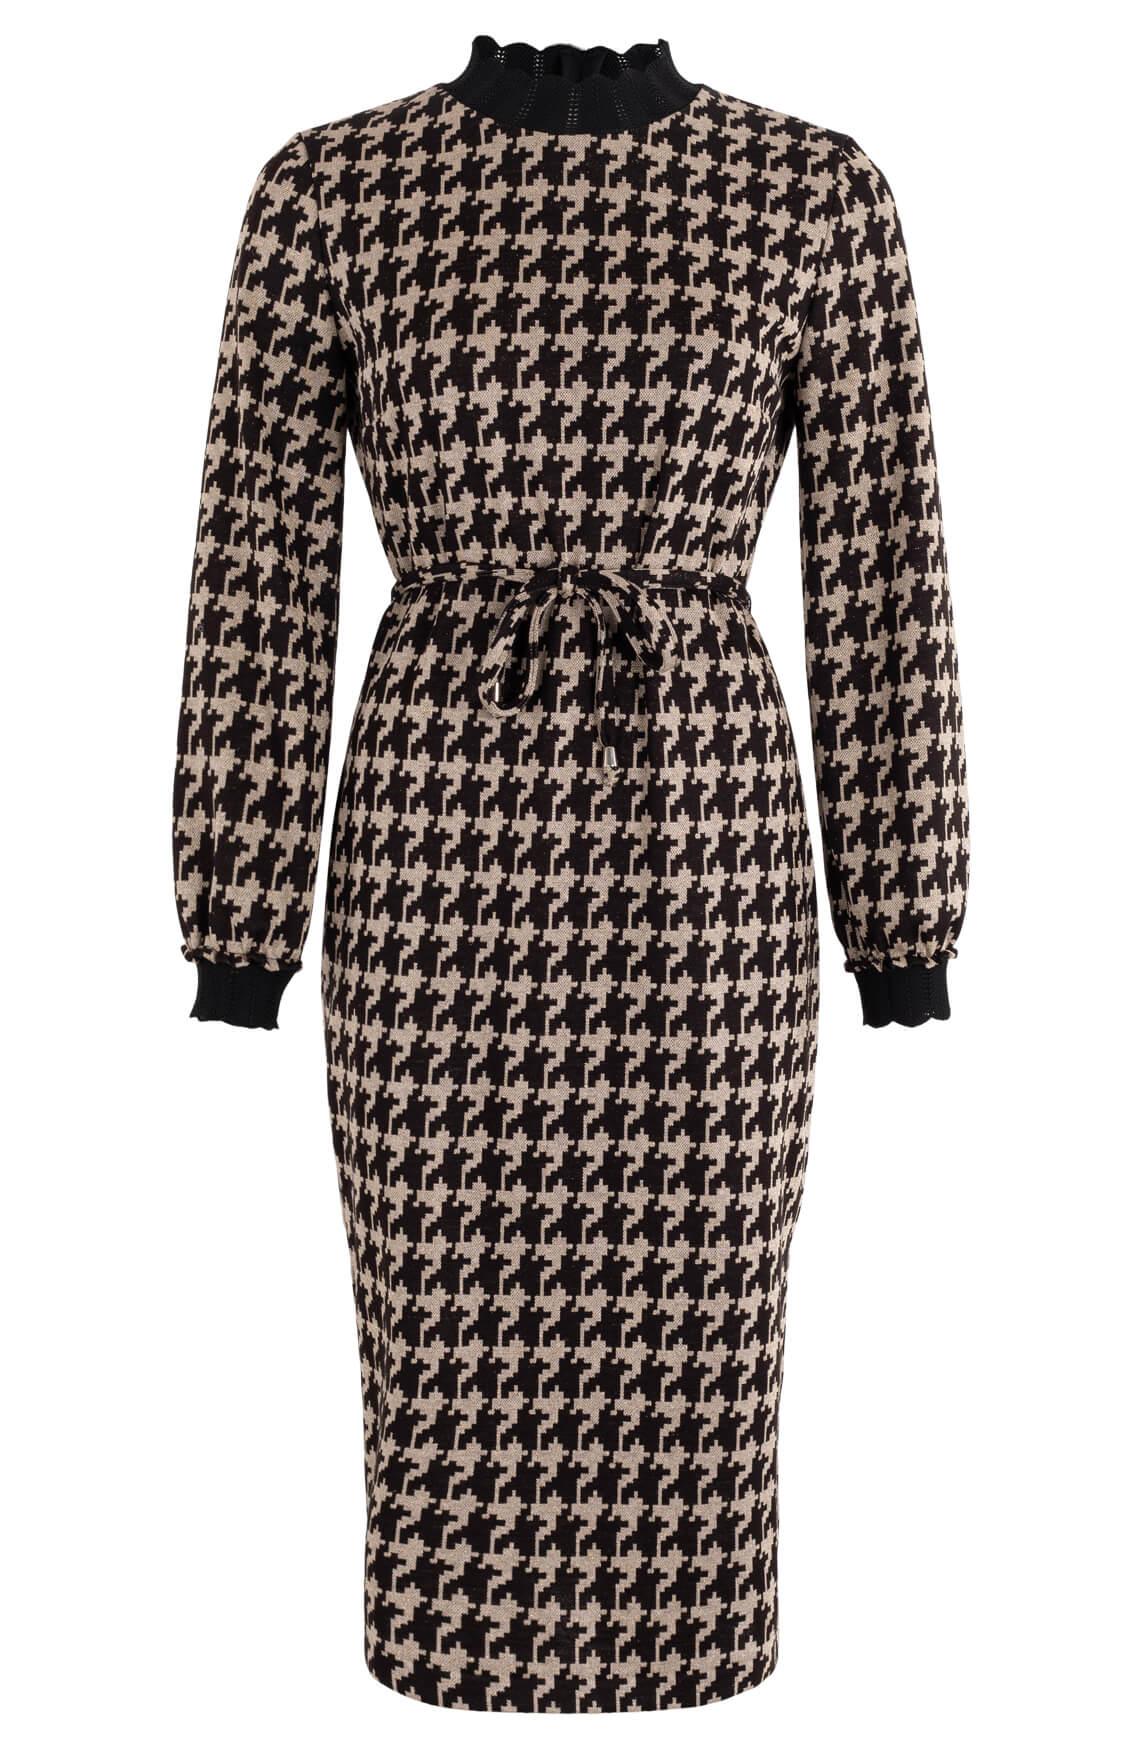 Ana Alcazar Dames Pied-de-poule jurk Zwart